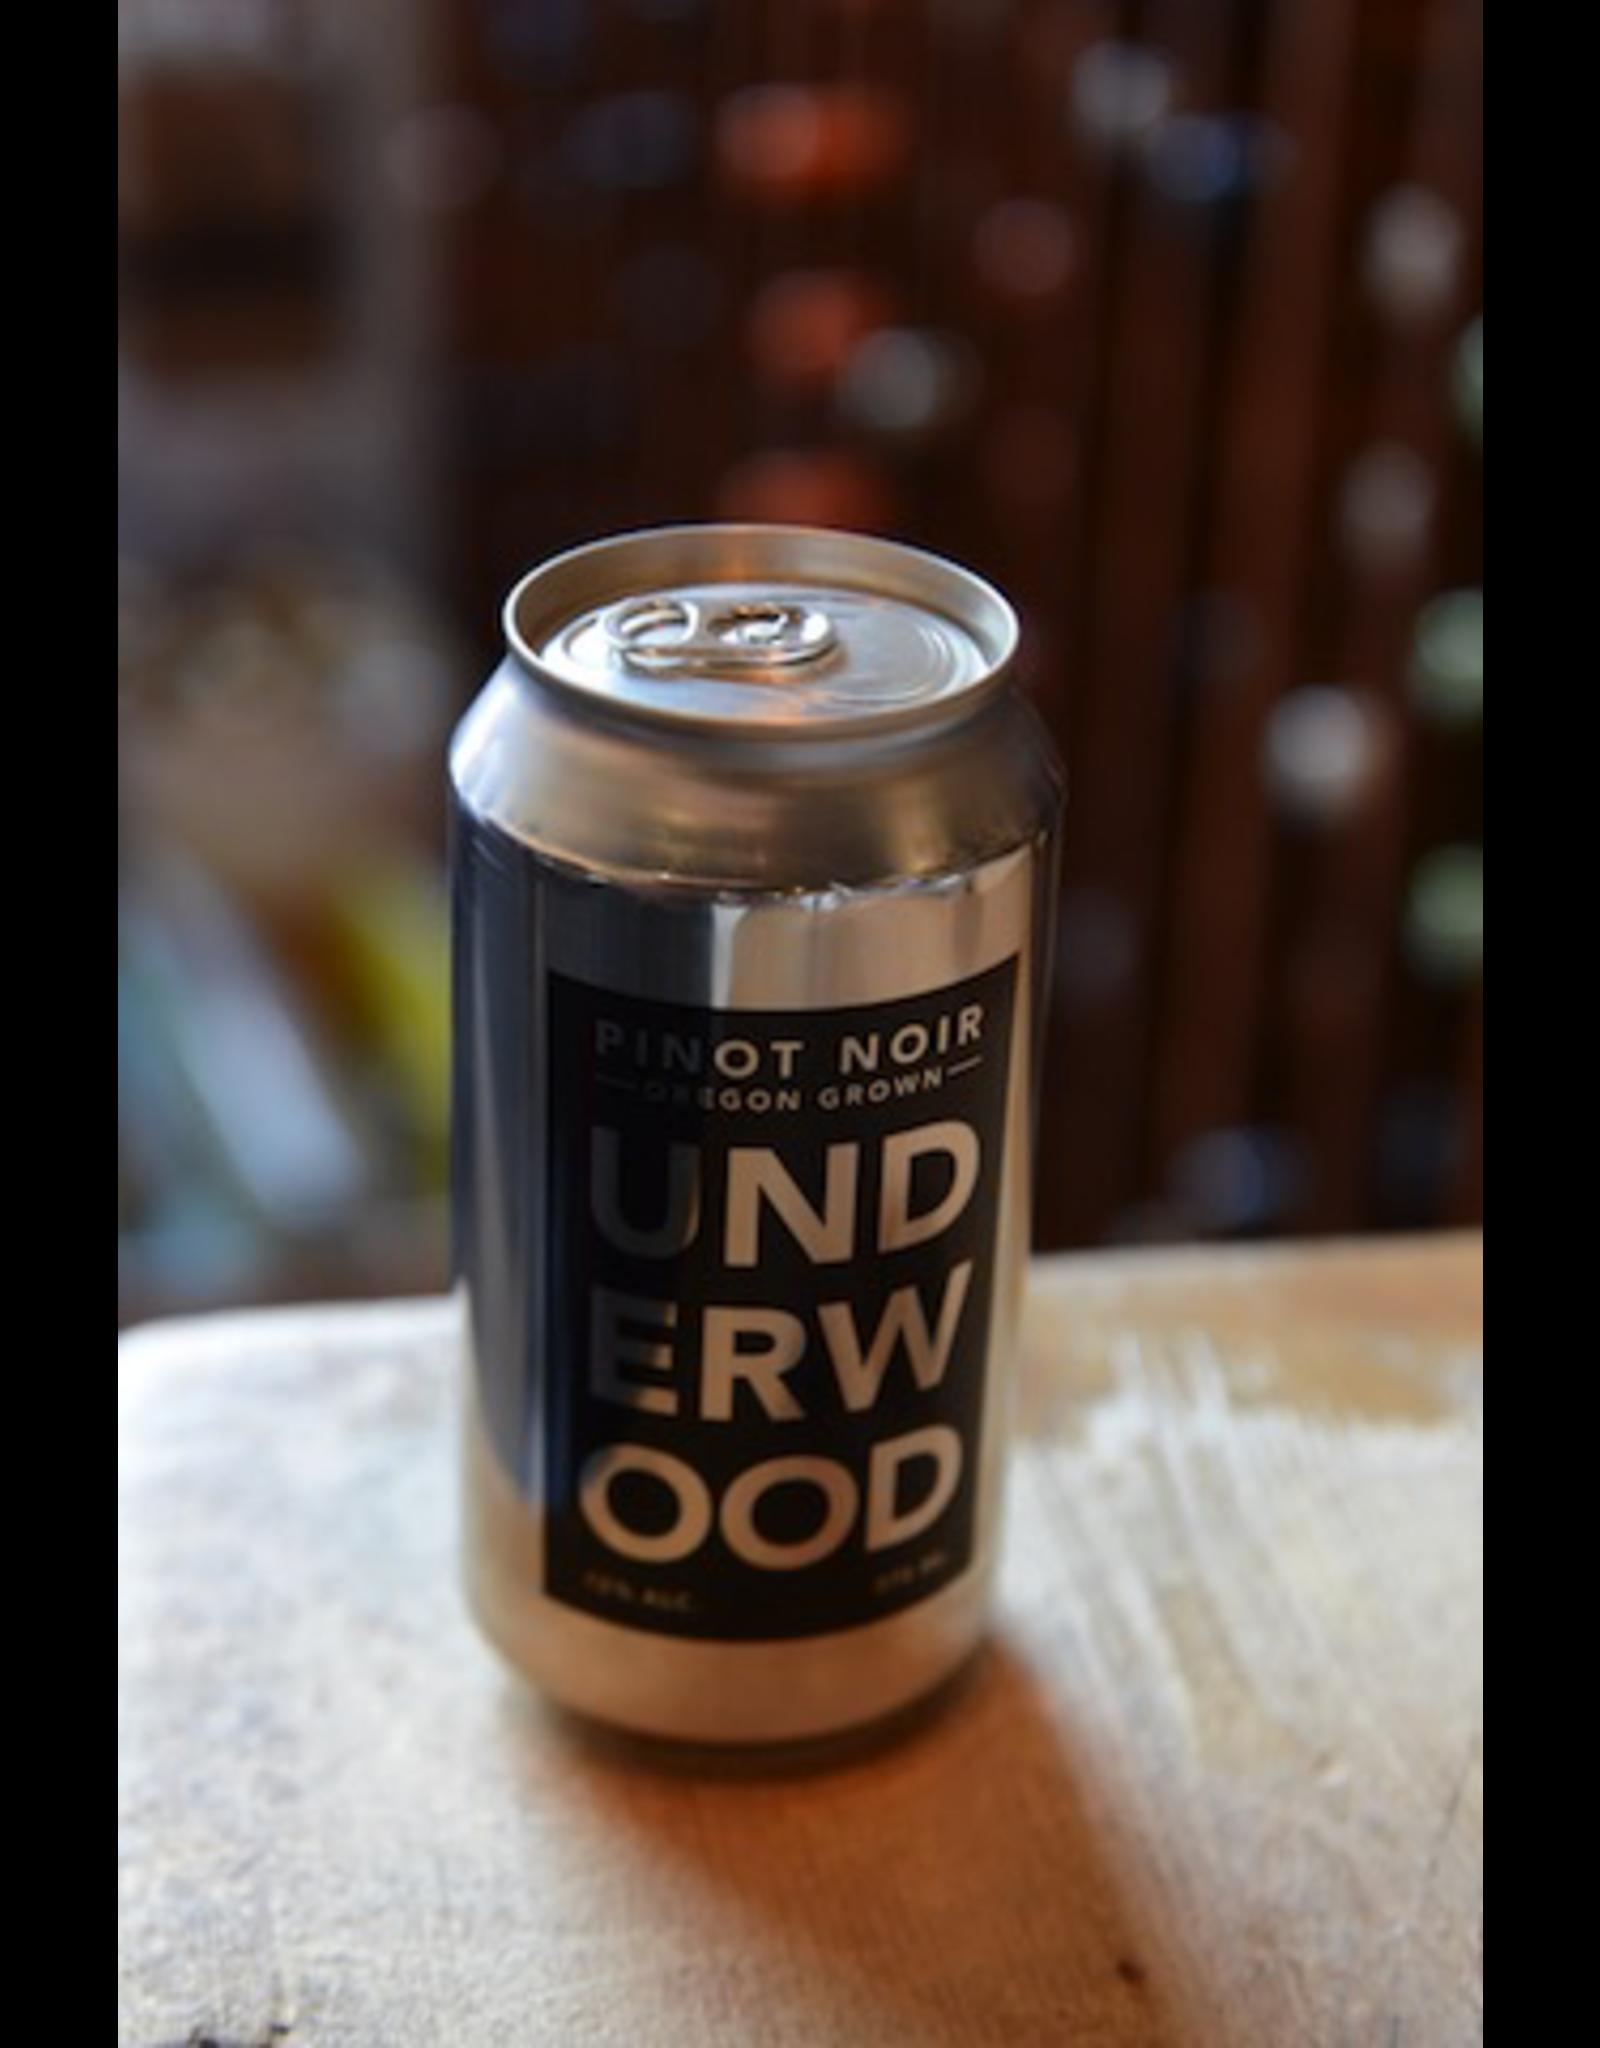 Wine NV Underwood Pinot Noir - Oregon (375ml can)